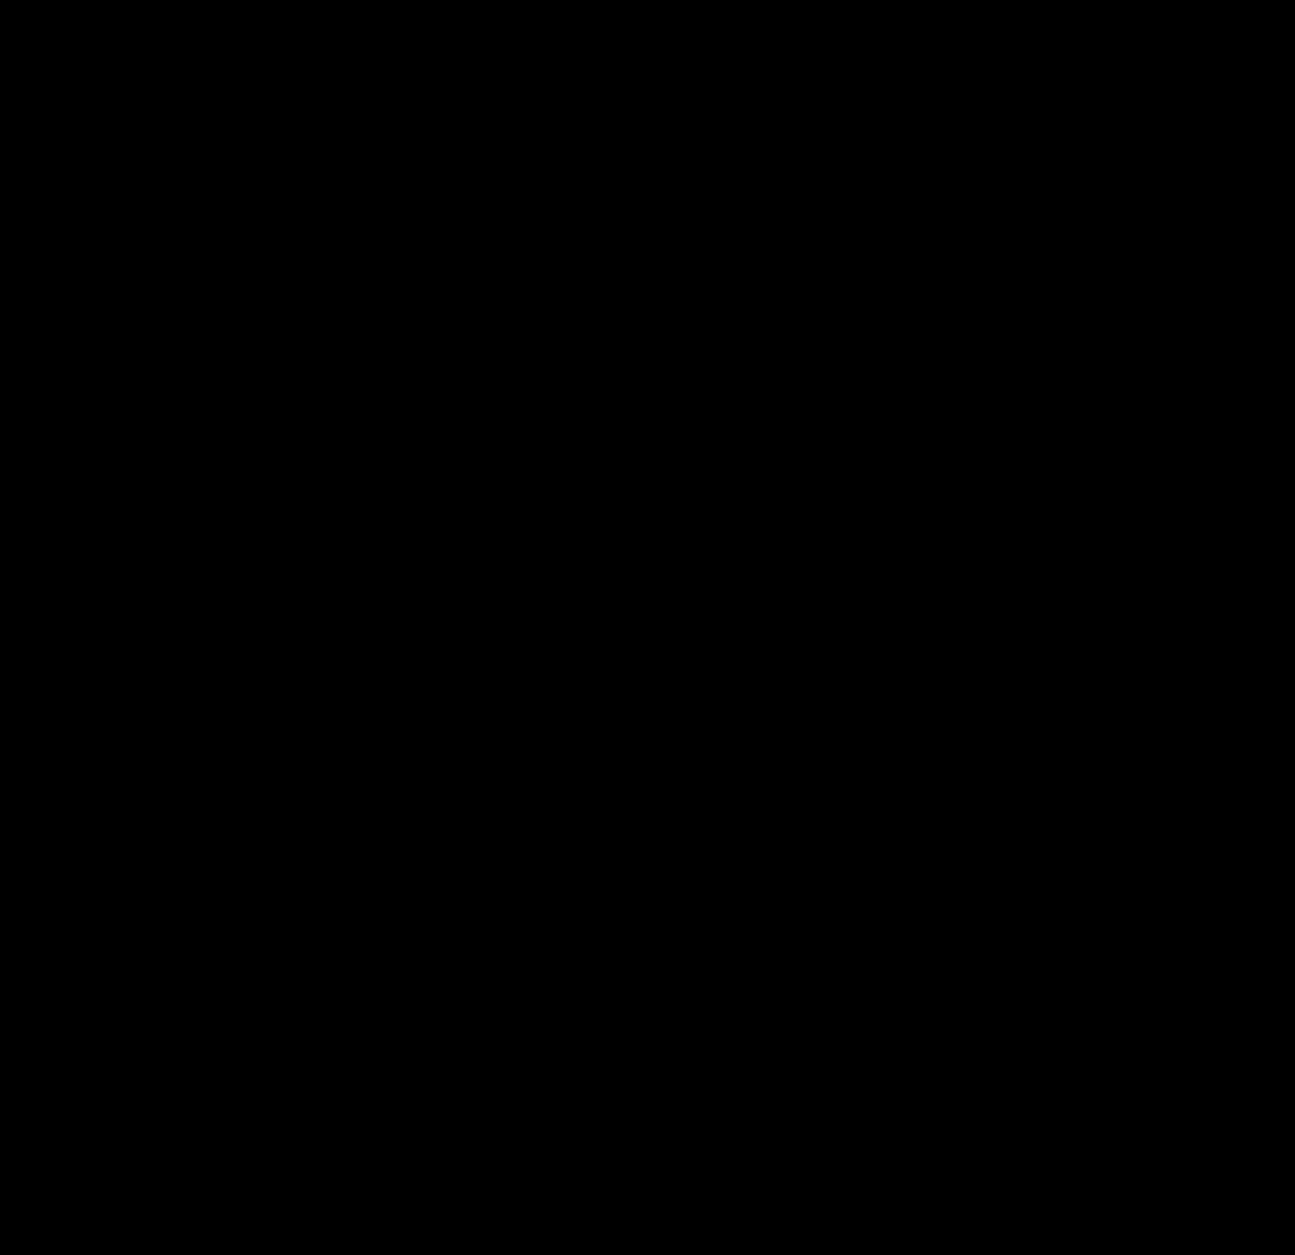 SM Trampolin 2./3. Juni 2018 Volketswil